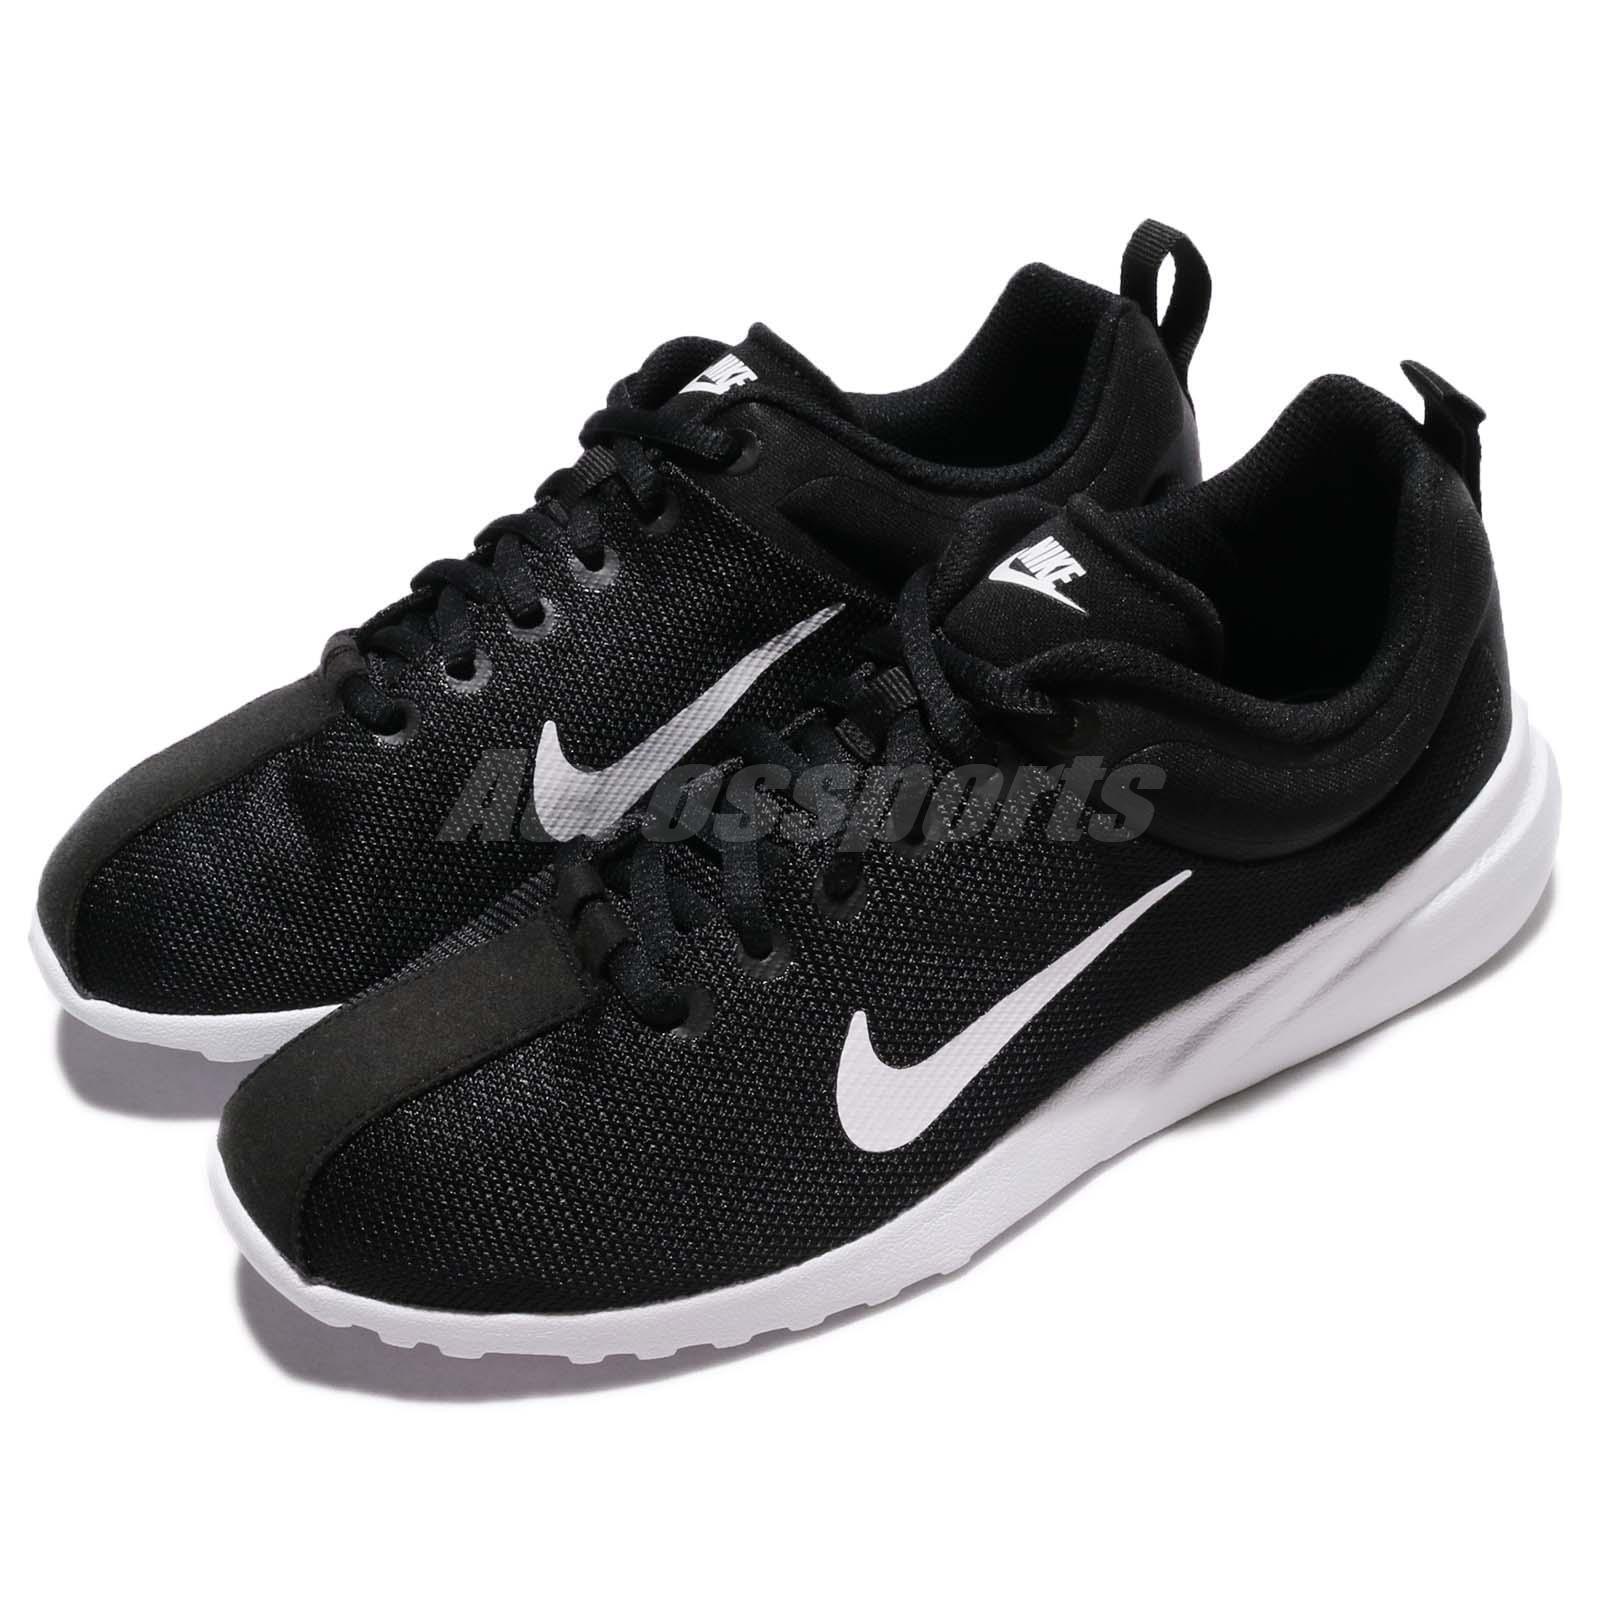 Wmns Nike Superflyte Black White Women Running Shoes Sneakers 916784-001 Seasonal price cuts, discount benefits